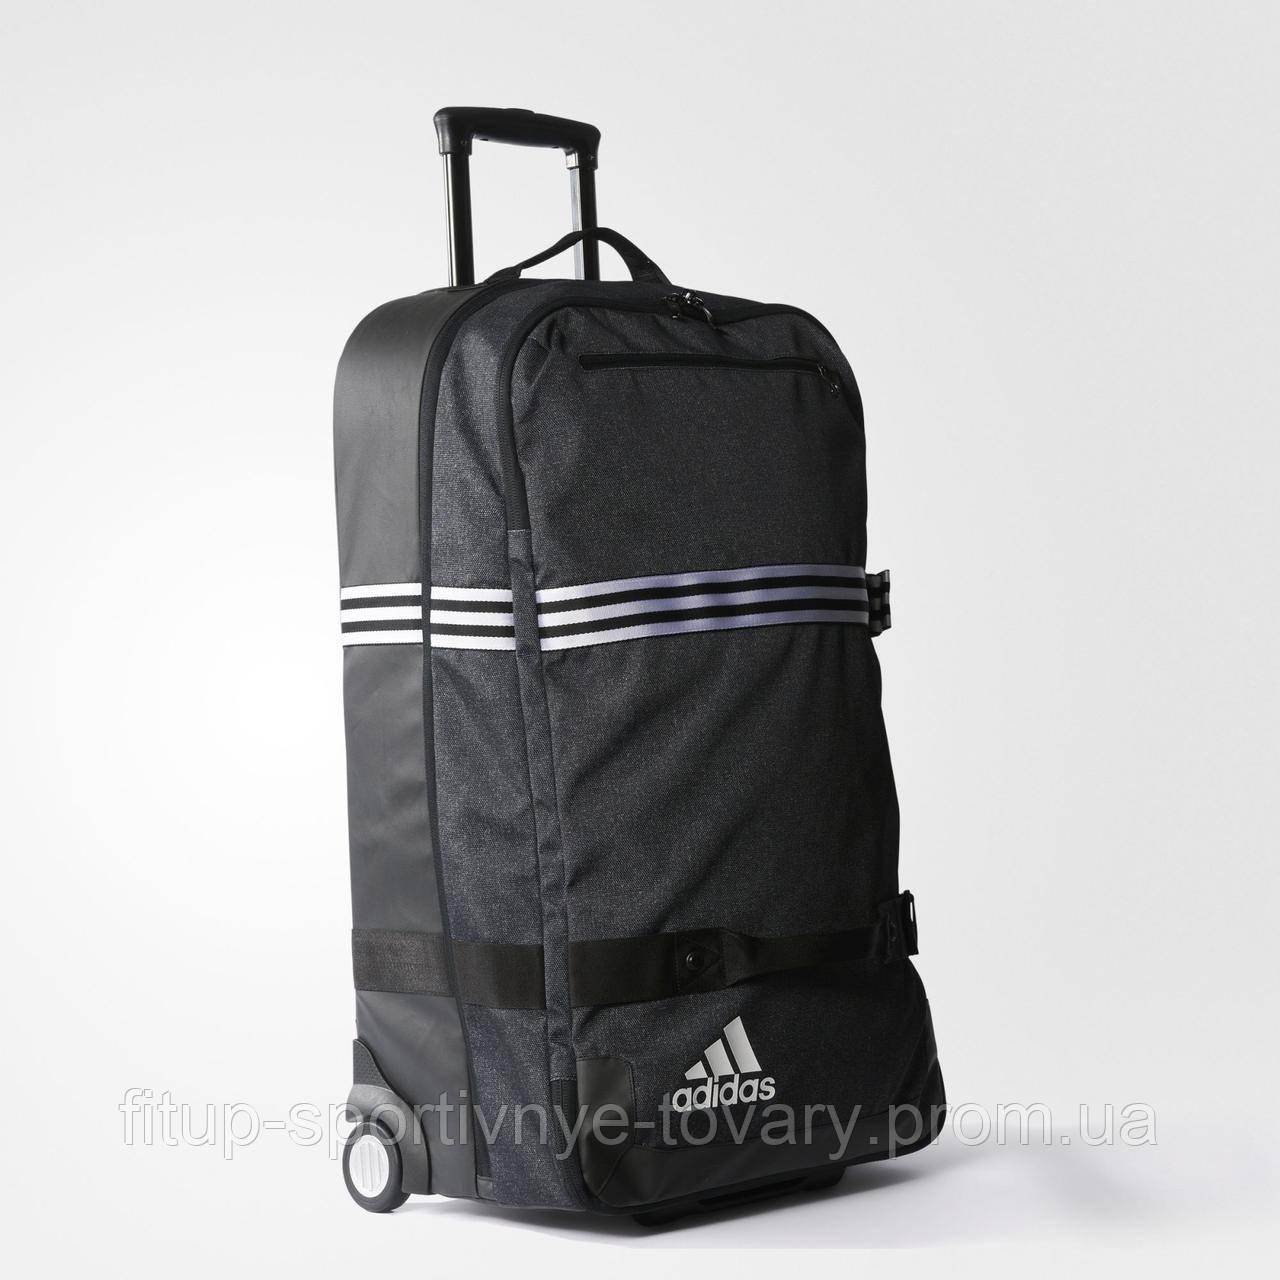 d0e0144ec590 Дорожная сумка Adidas TEAM TROLLEY XL AI3821: продажа, цена в Киеве ...